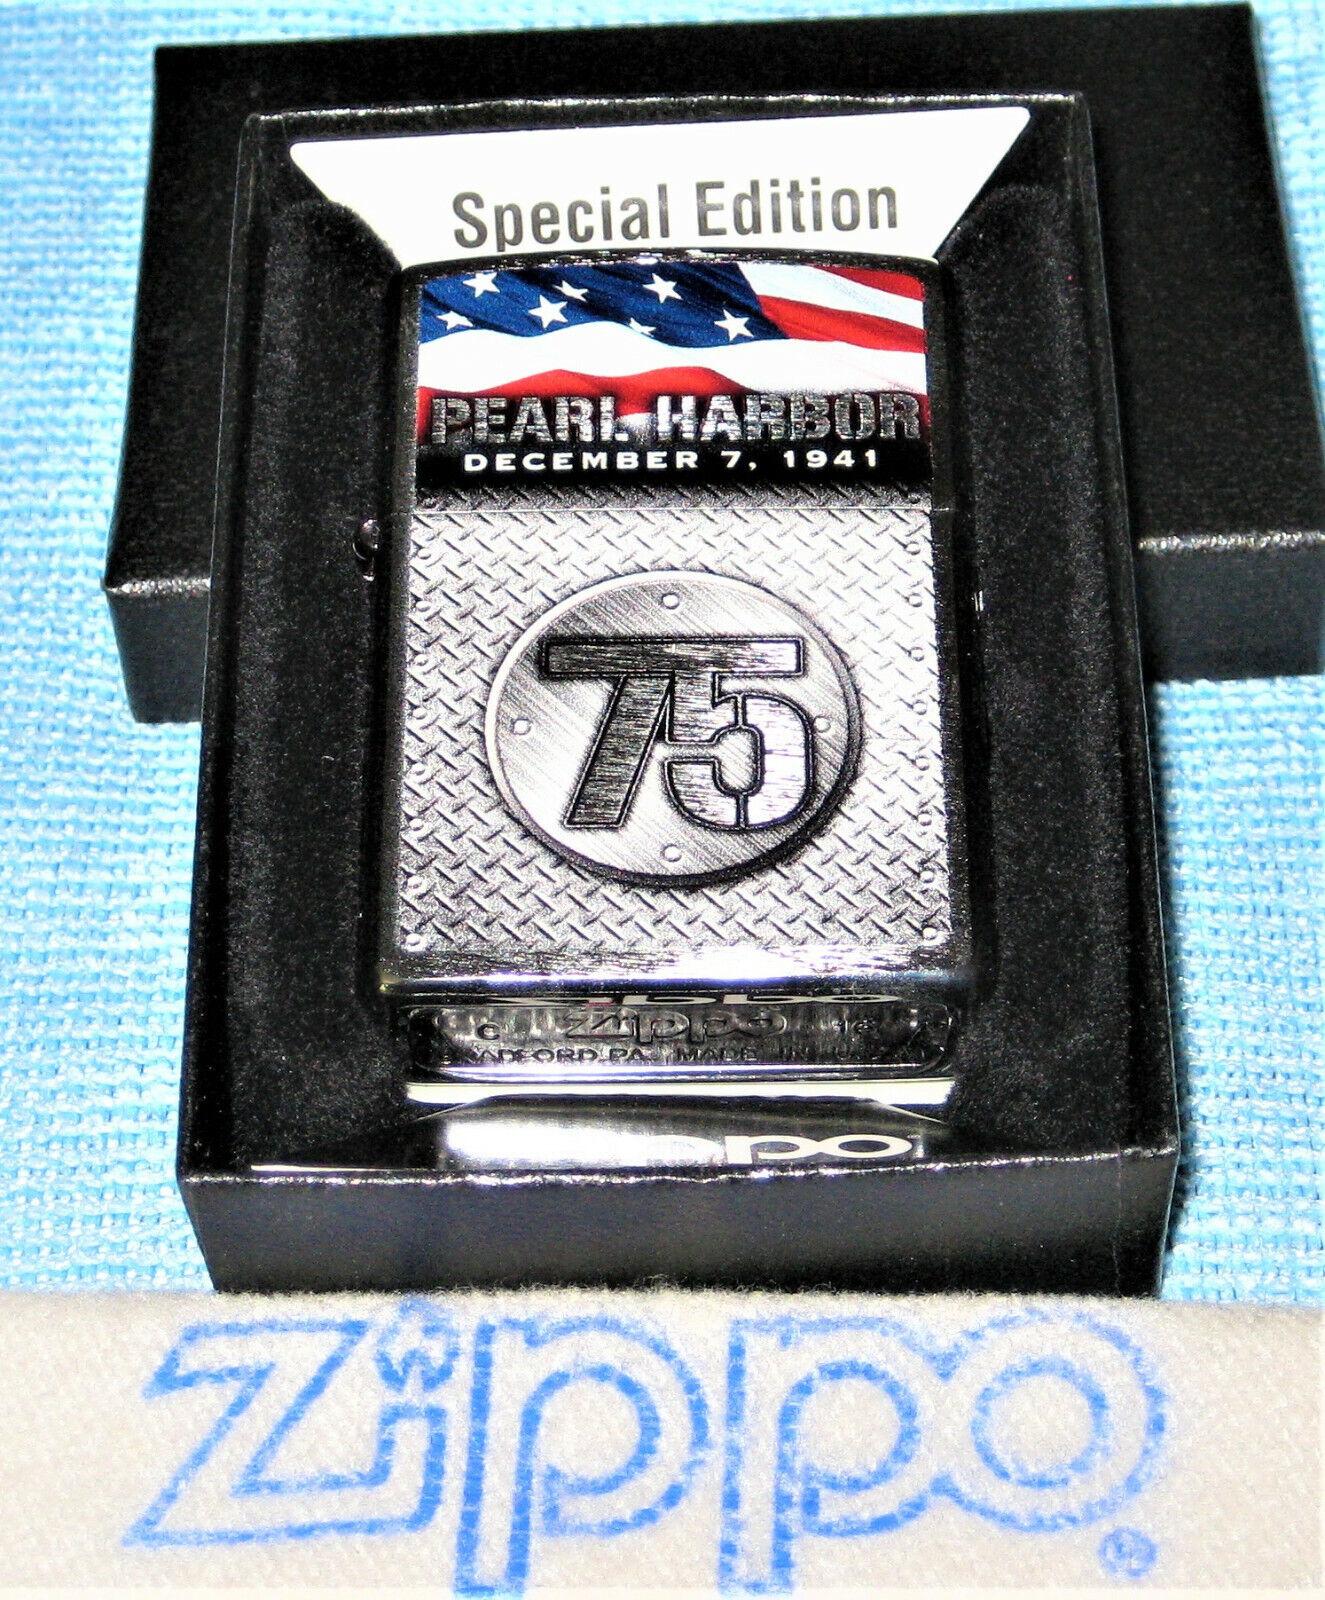 ZIPPO MILITARY Lighter 75th ANNIV PEARL HARBOR Sealed 29176